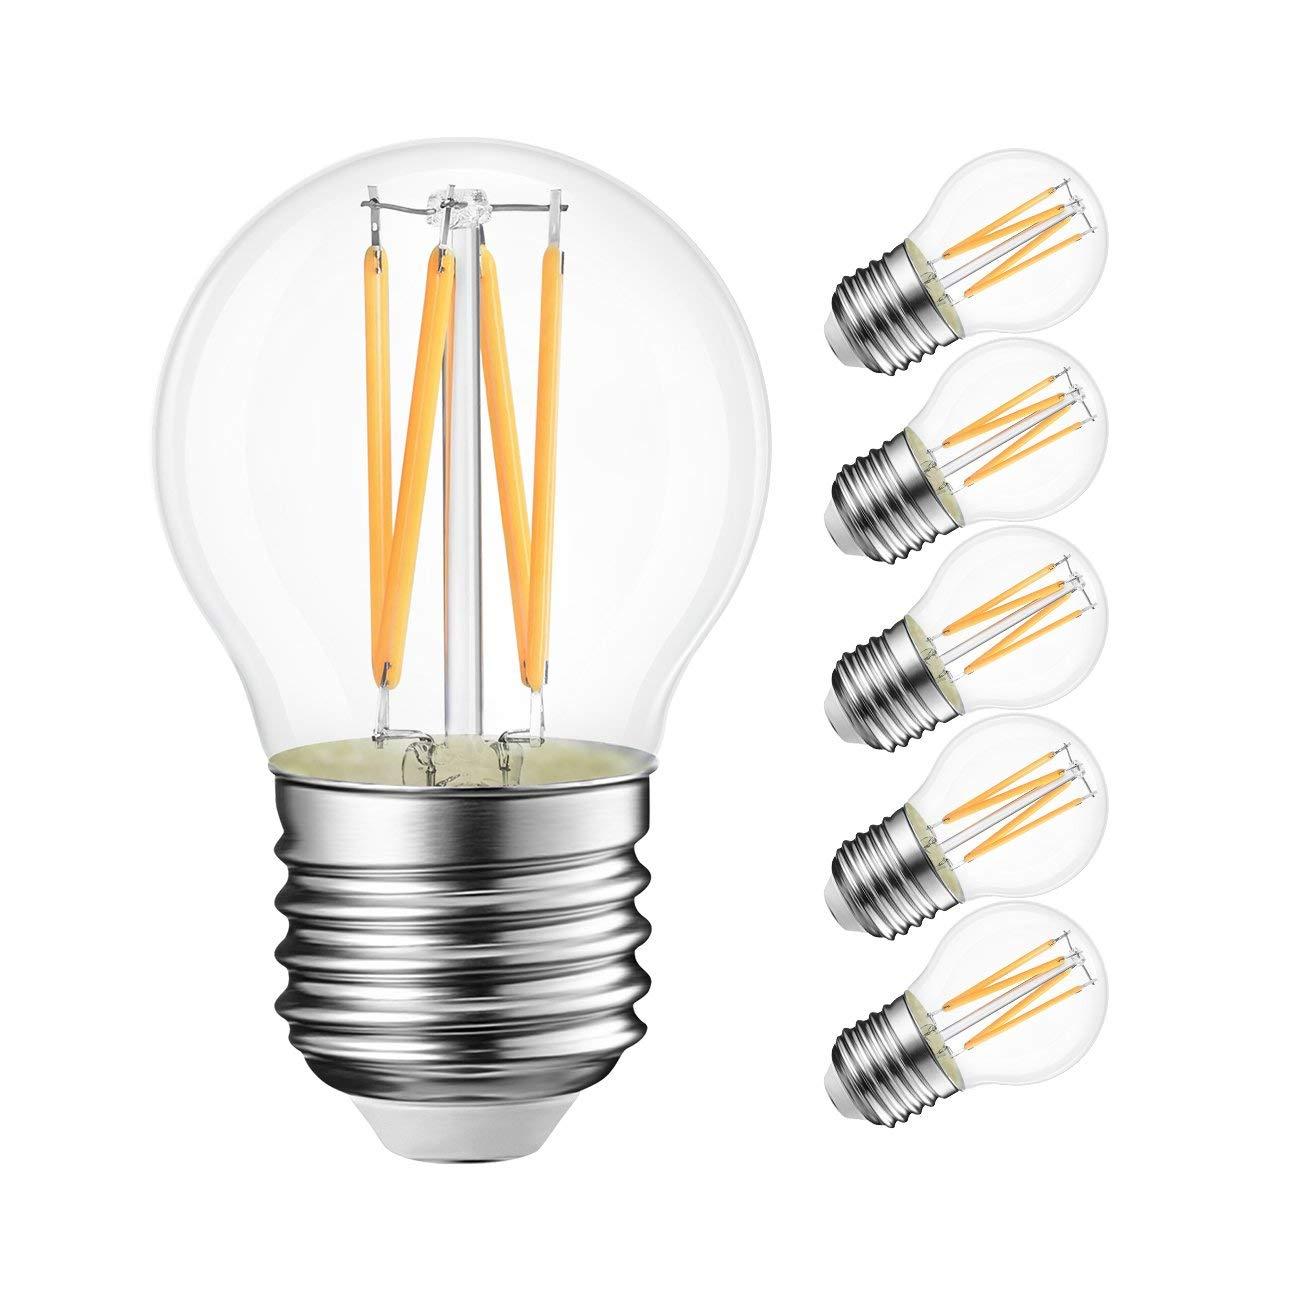 hight resolution of e14 light bulb socket wiring lifx led night bulb and socket wiring kit bulb socket wiring